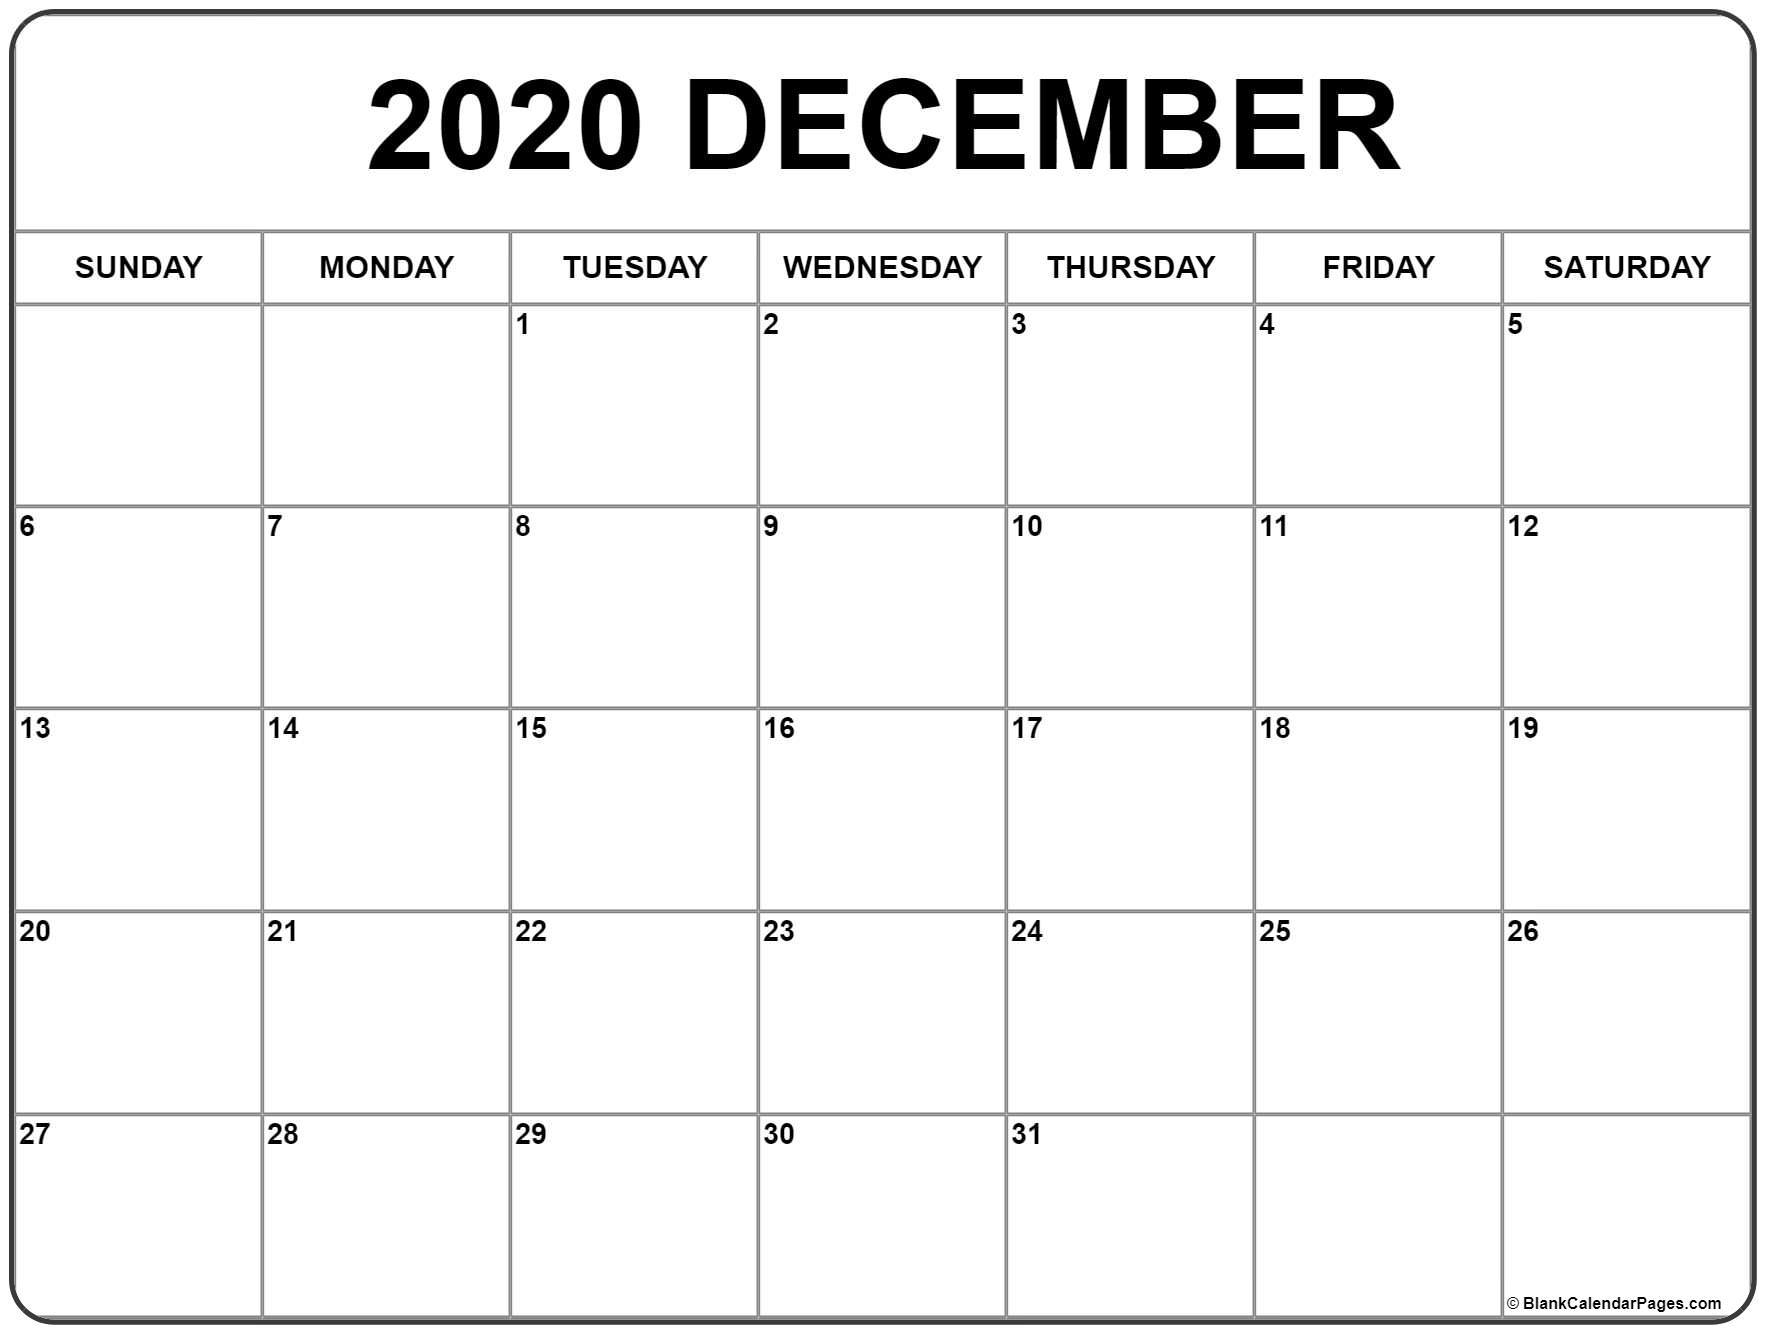 December 2020 Calendar | Free Printable Monthly Calendars for Free Fill In Printable Calendars